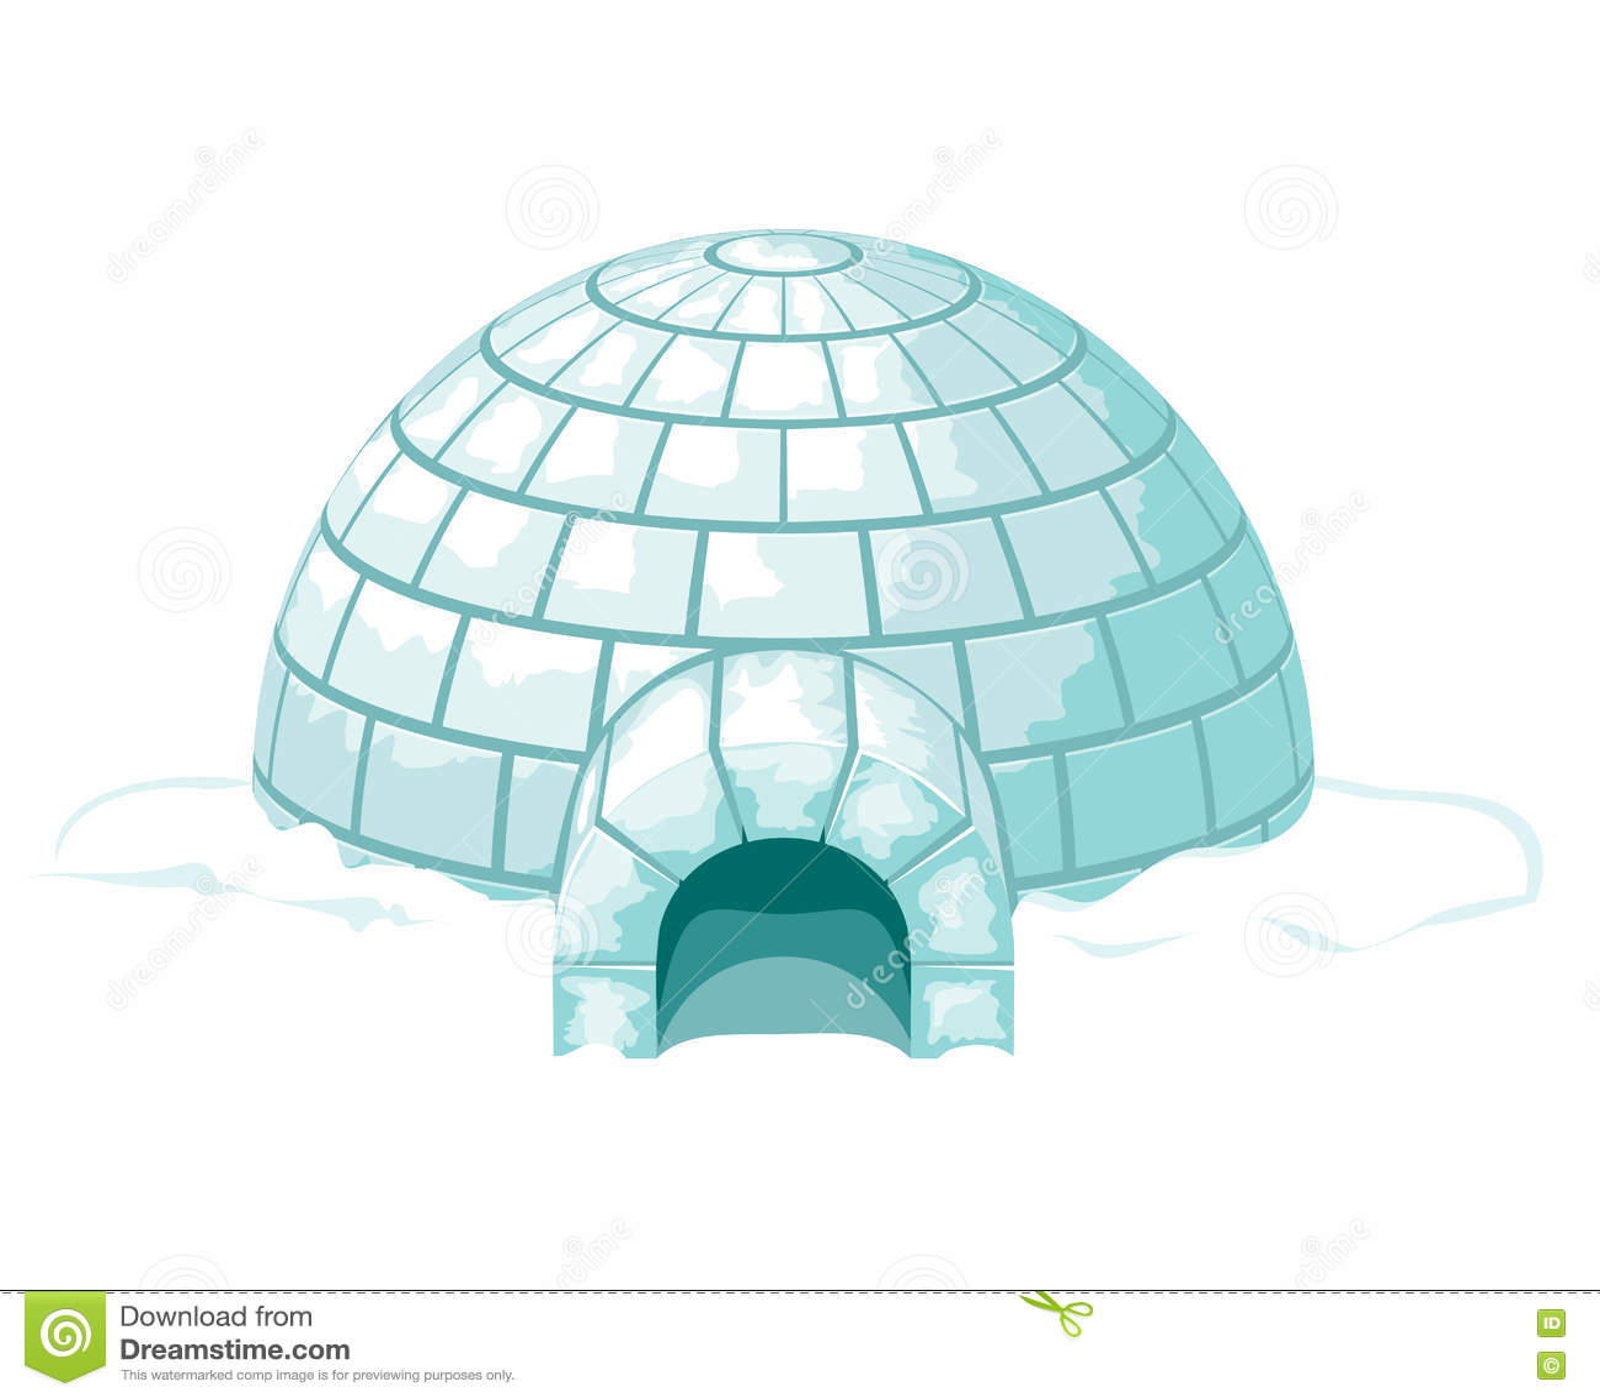 Iglu Eisige kalte Ausgangs- oder Eishausvektorillustration